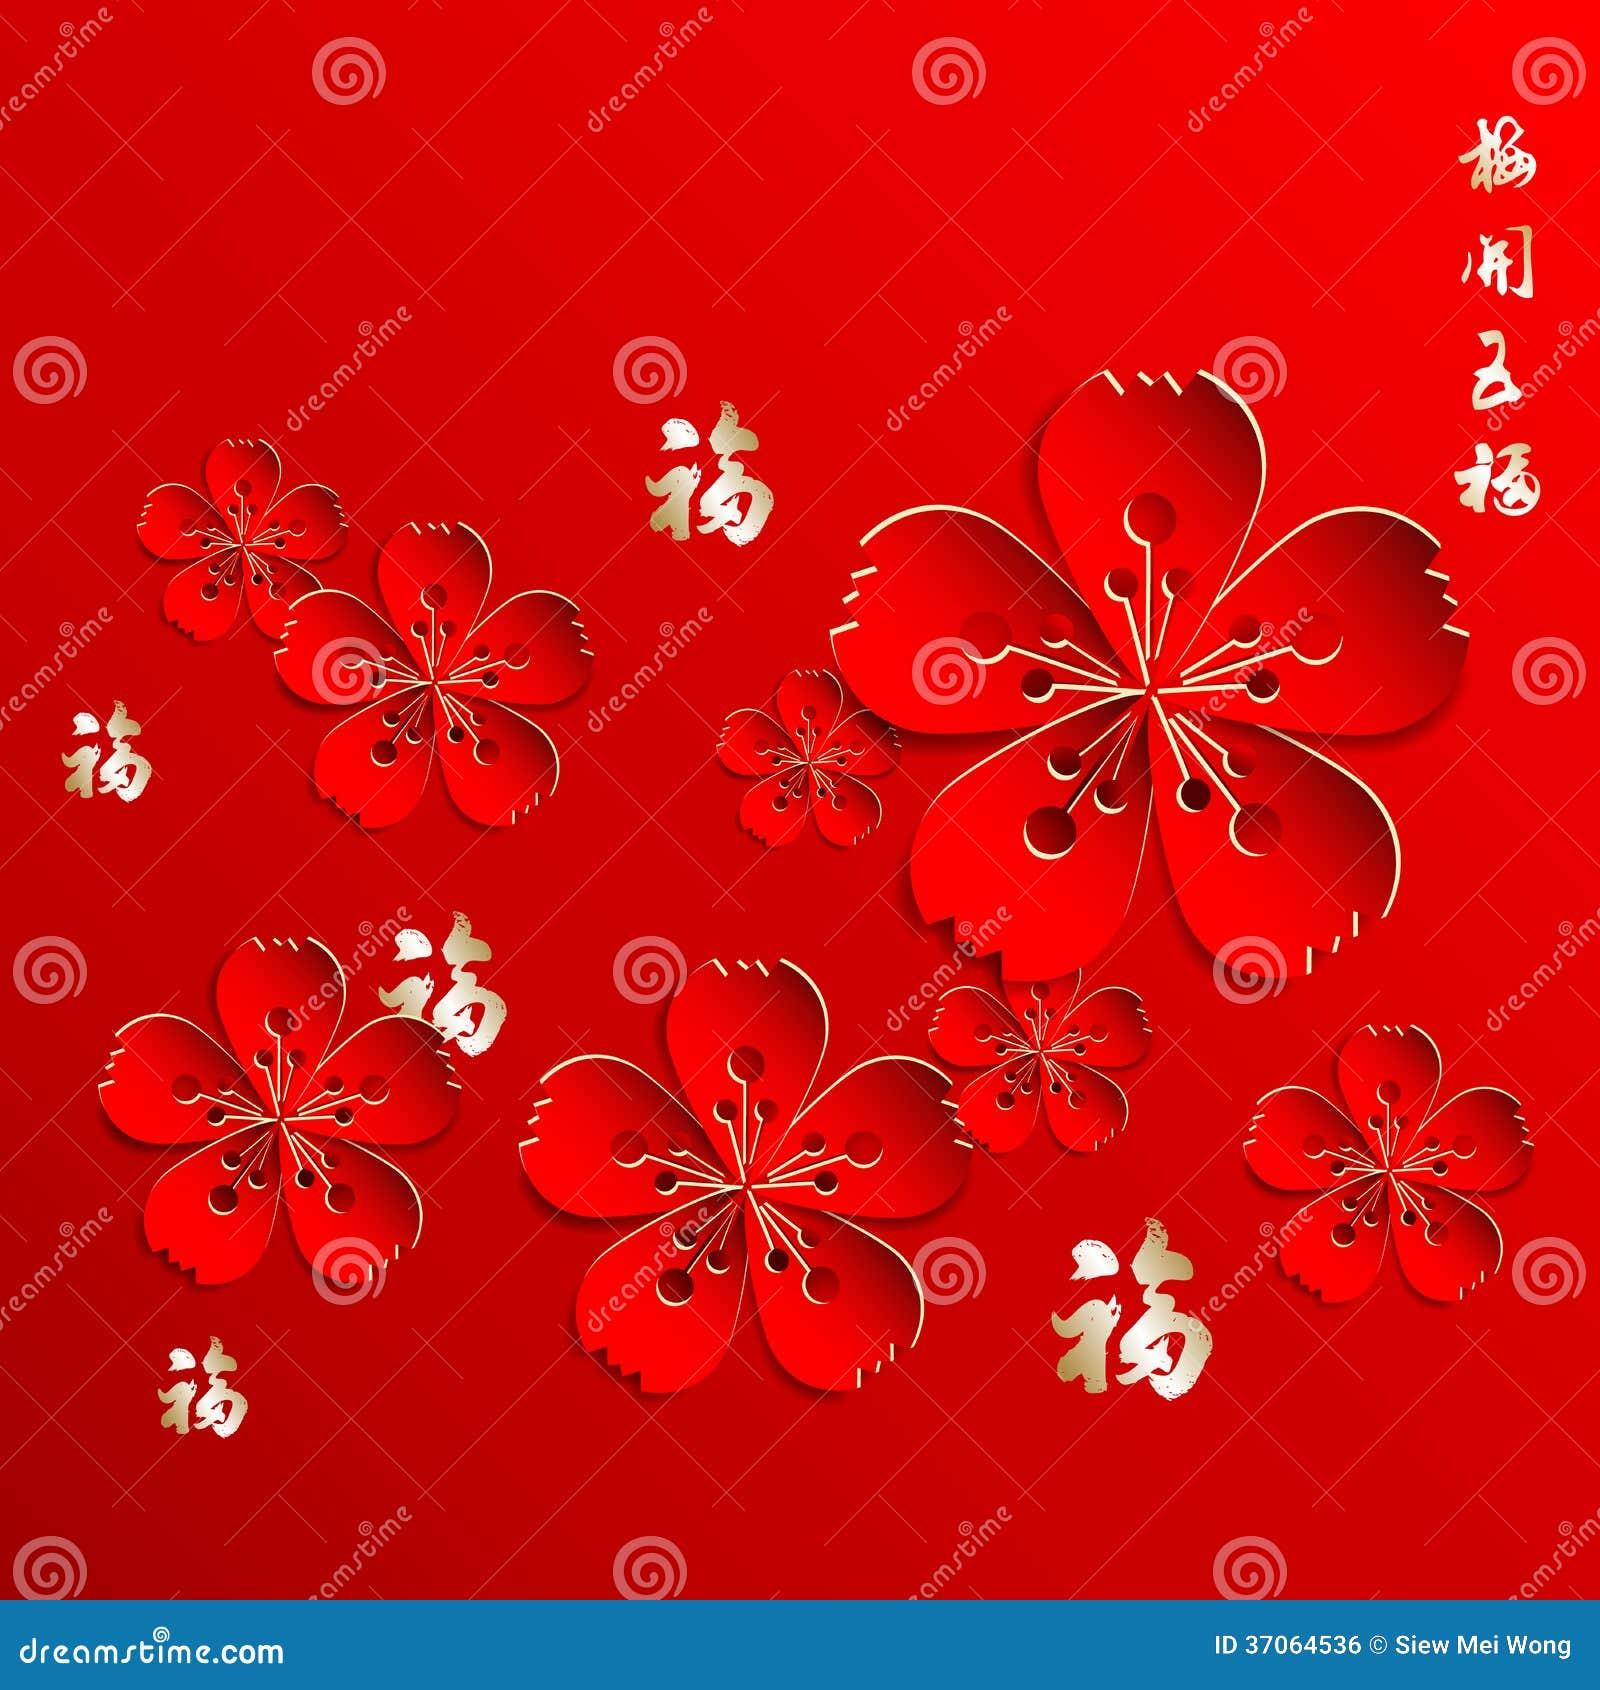 Chinese New Year Flower Background Royalty Free Stock Image - Image ...